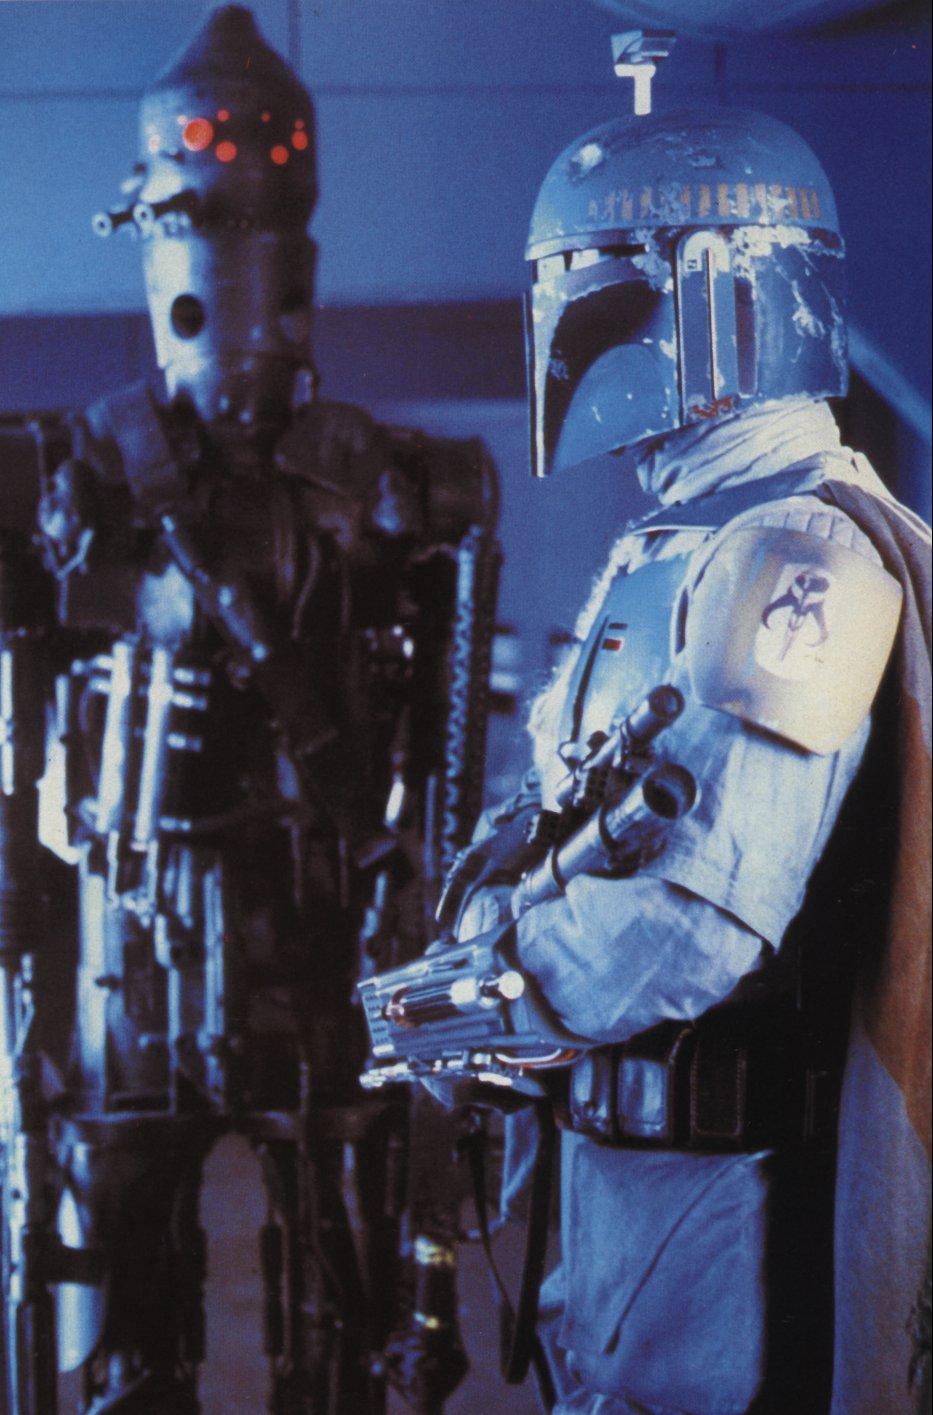 Star Wars - Vintage - Photos d'époque. - Page 15 Boba-f11